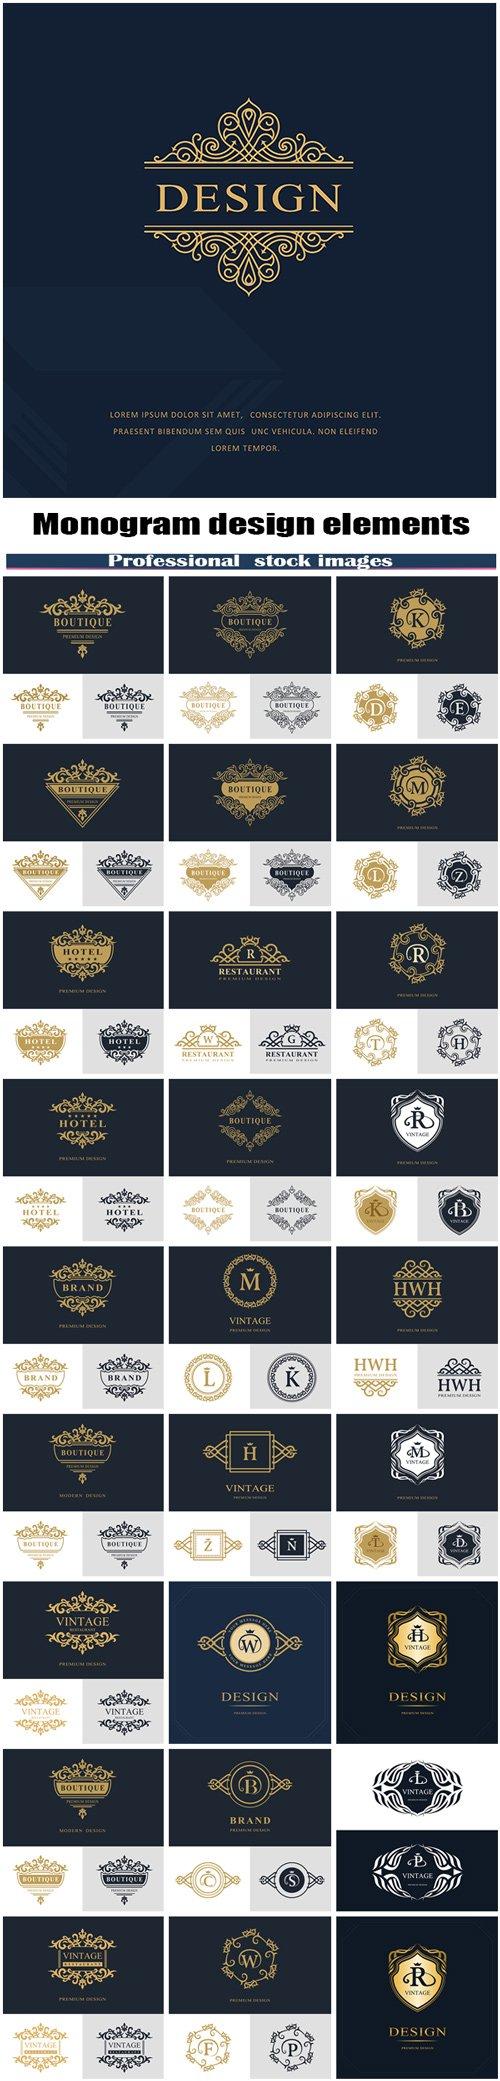 Monogram design elements set